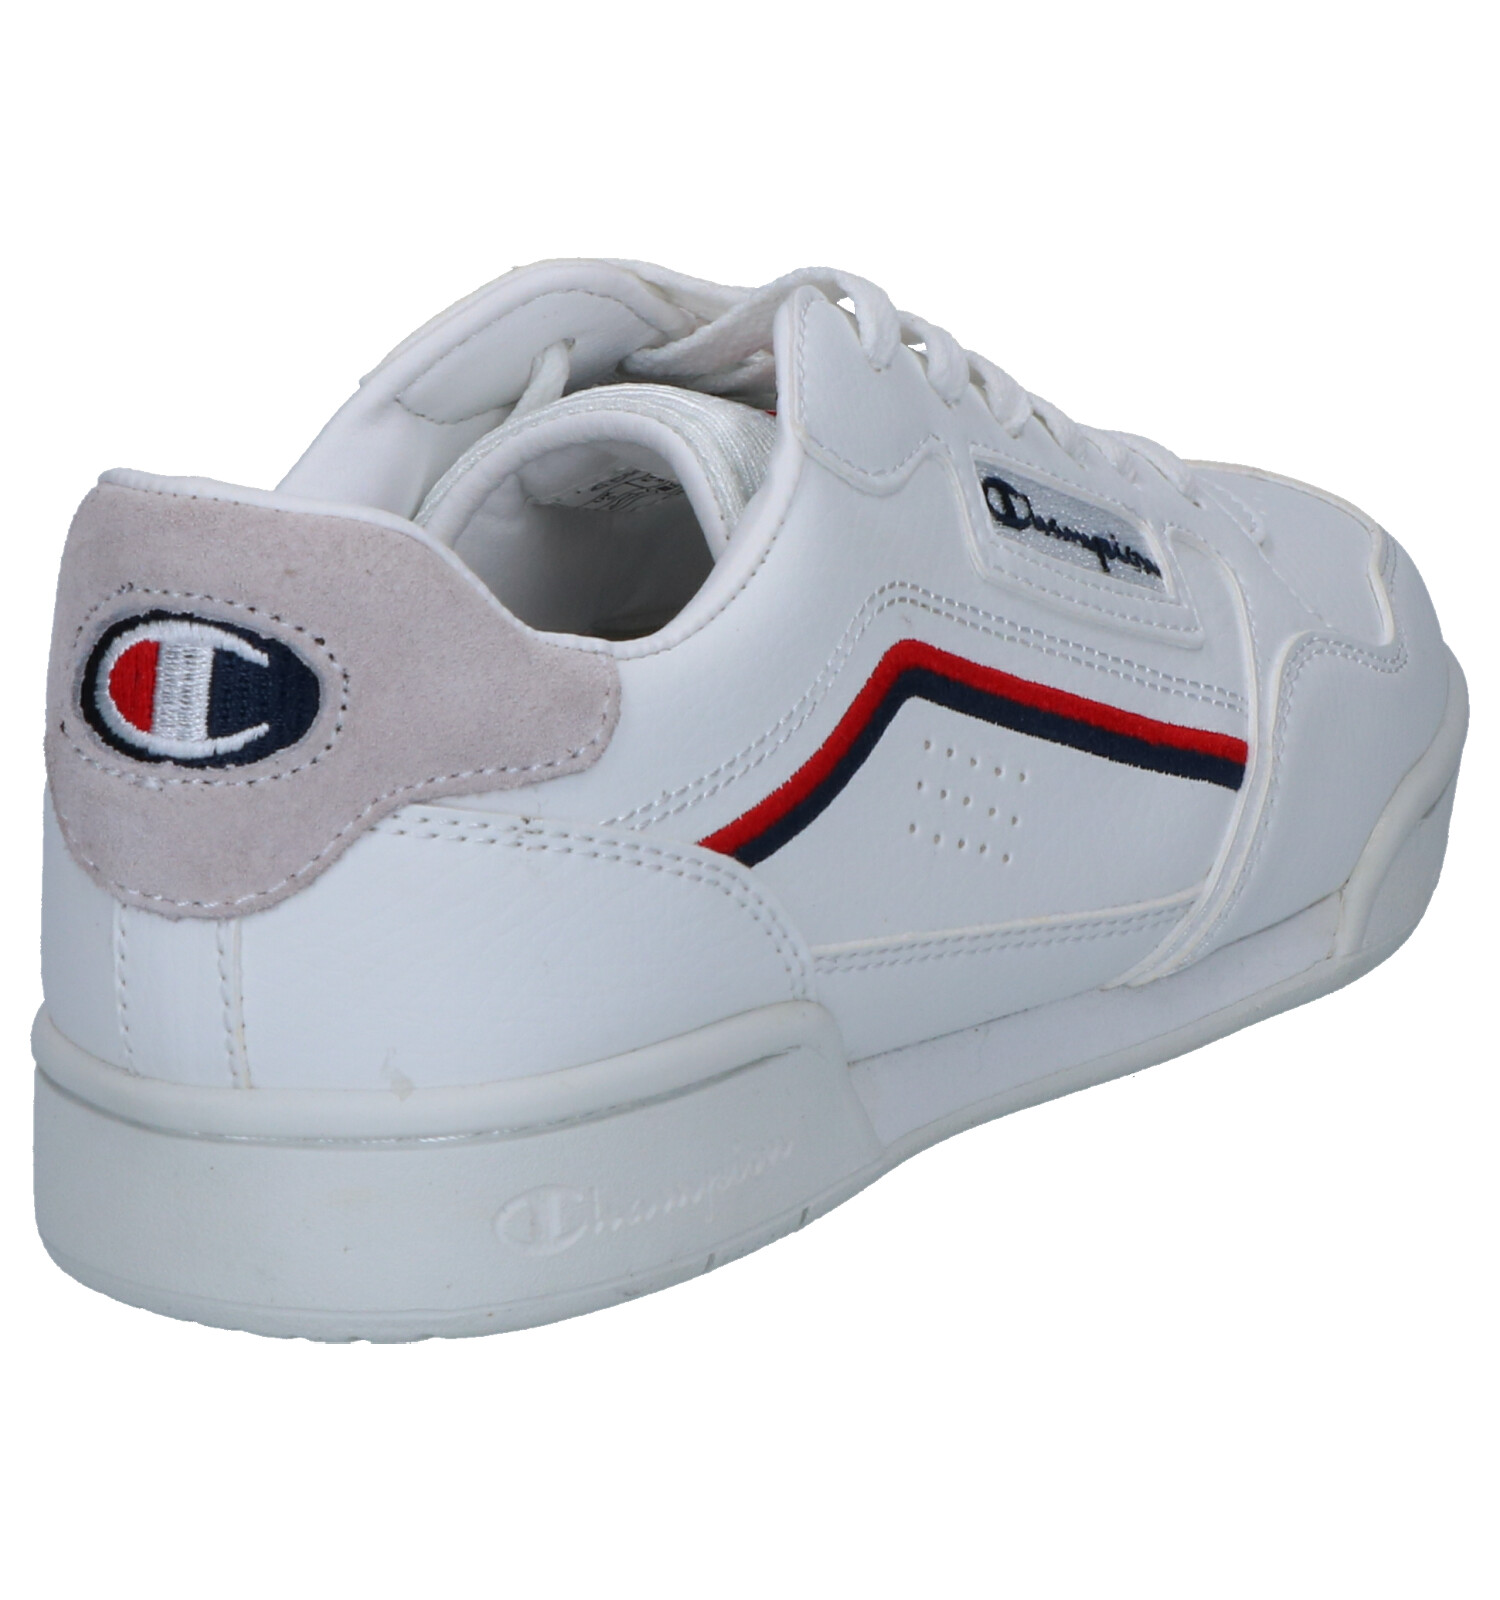 Champion Angeles Sneakers Witte Low Los eCordxB